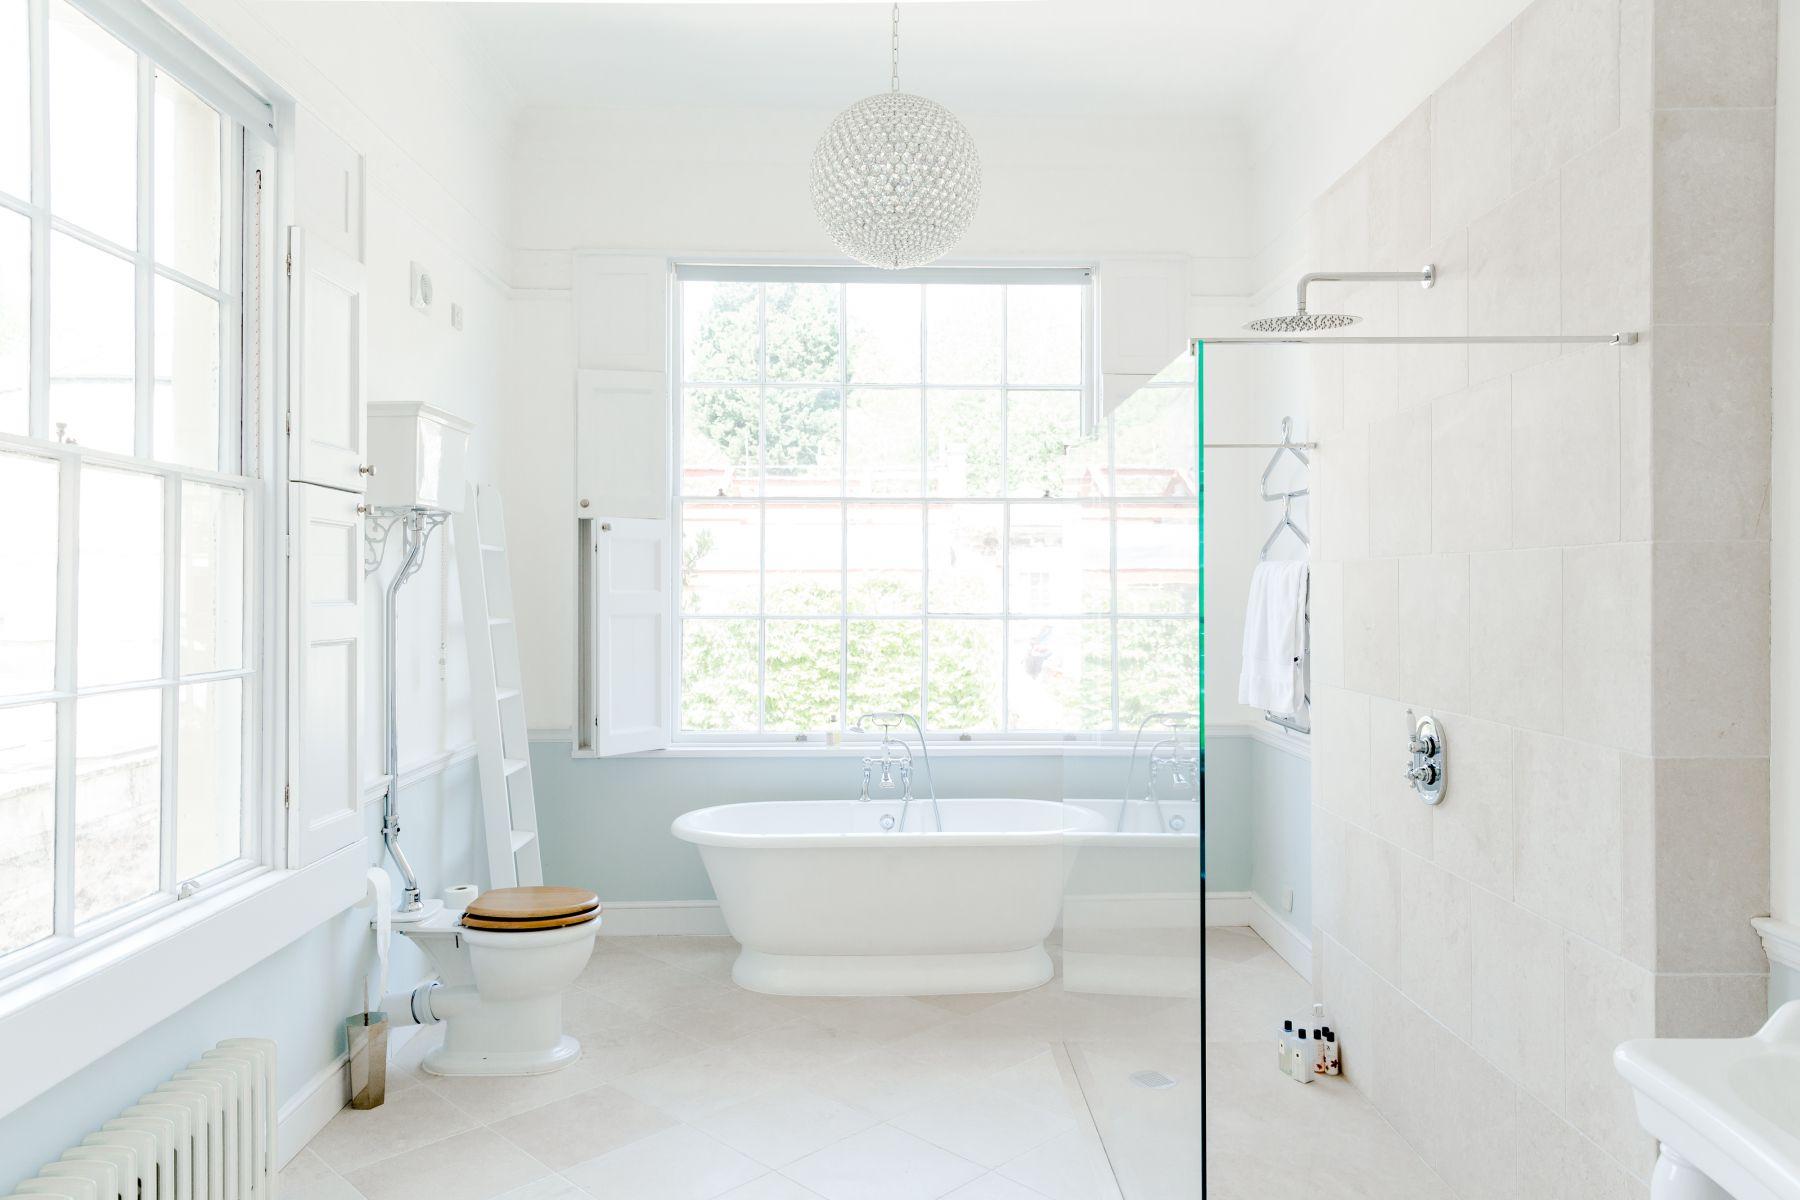 Bespoke Windows Wiltshire Bath Amp Oxford Hawker Joinery